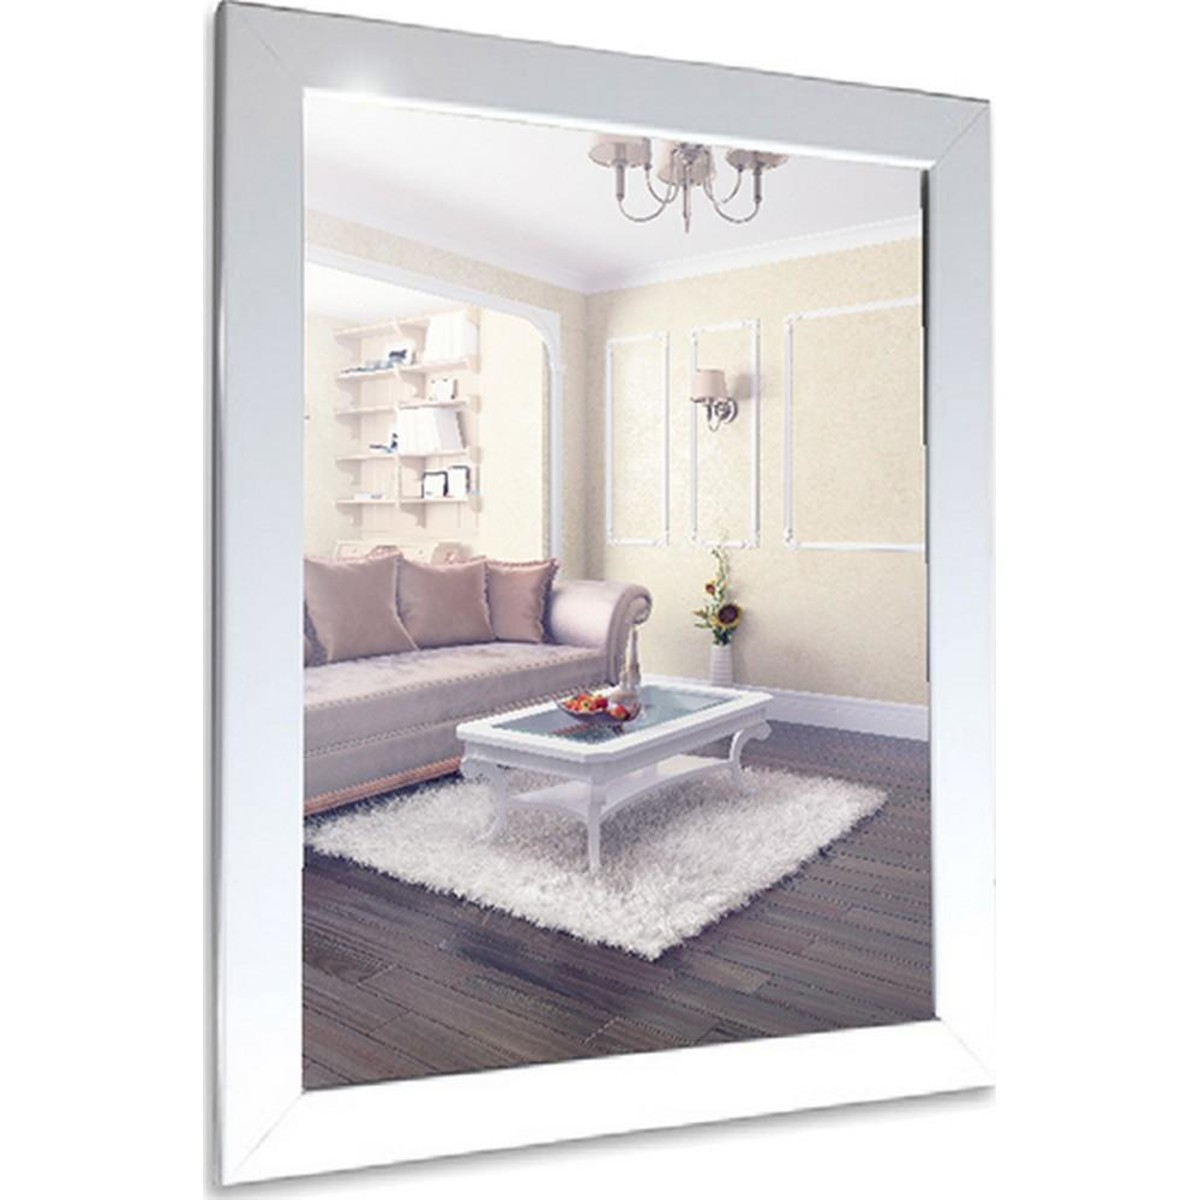 Зеркало без подсветки Mixline Багет 537432